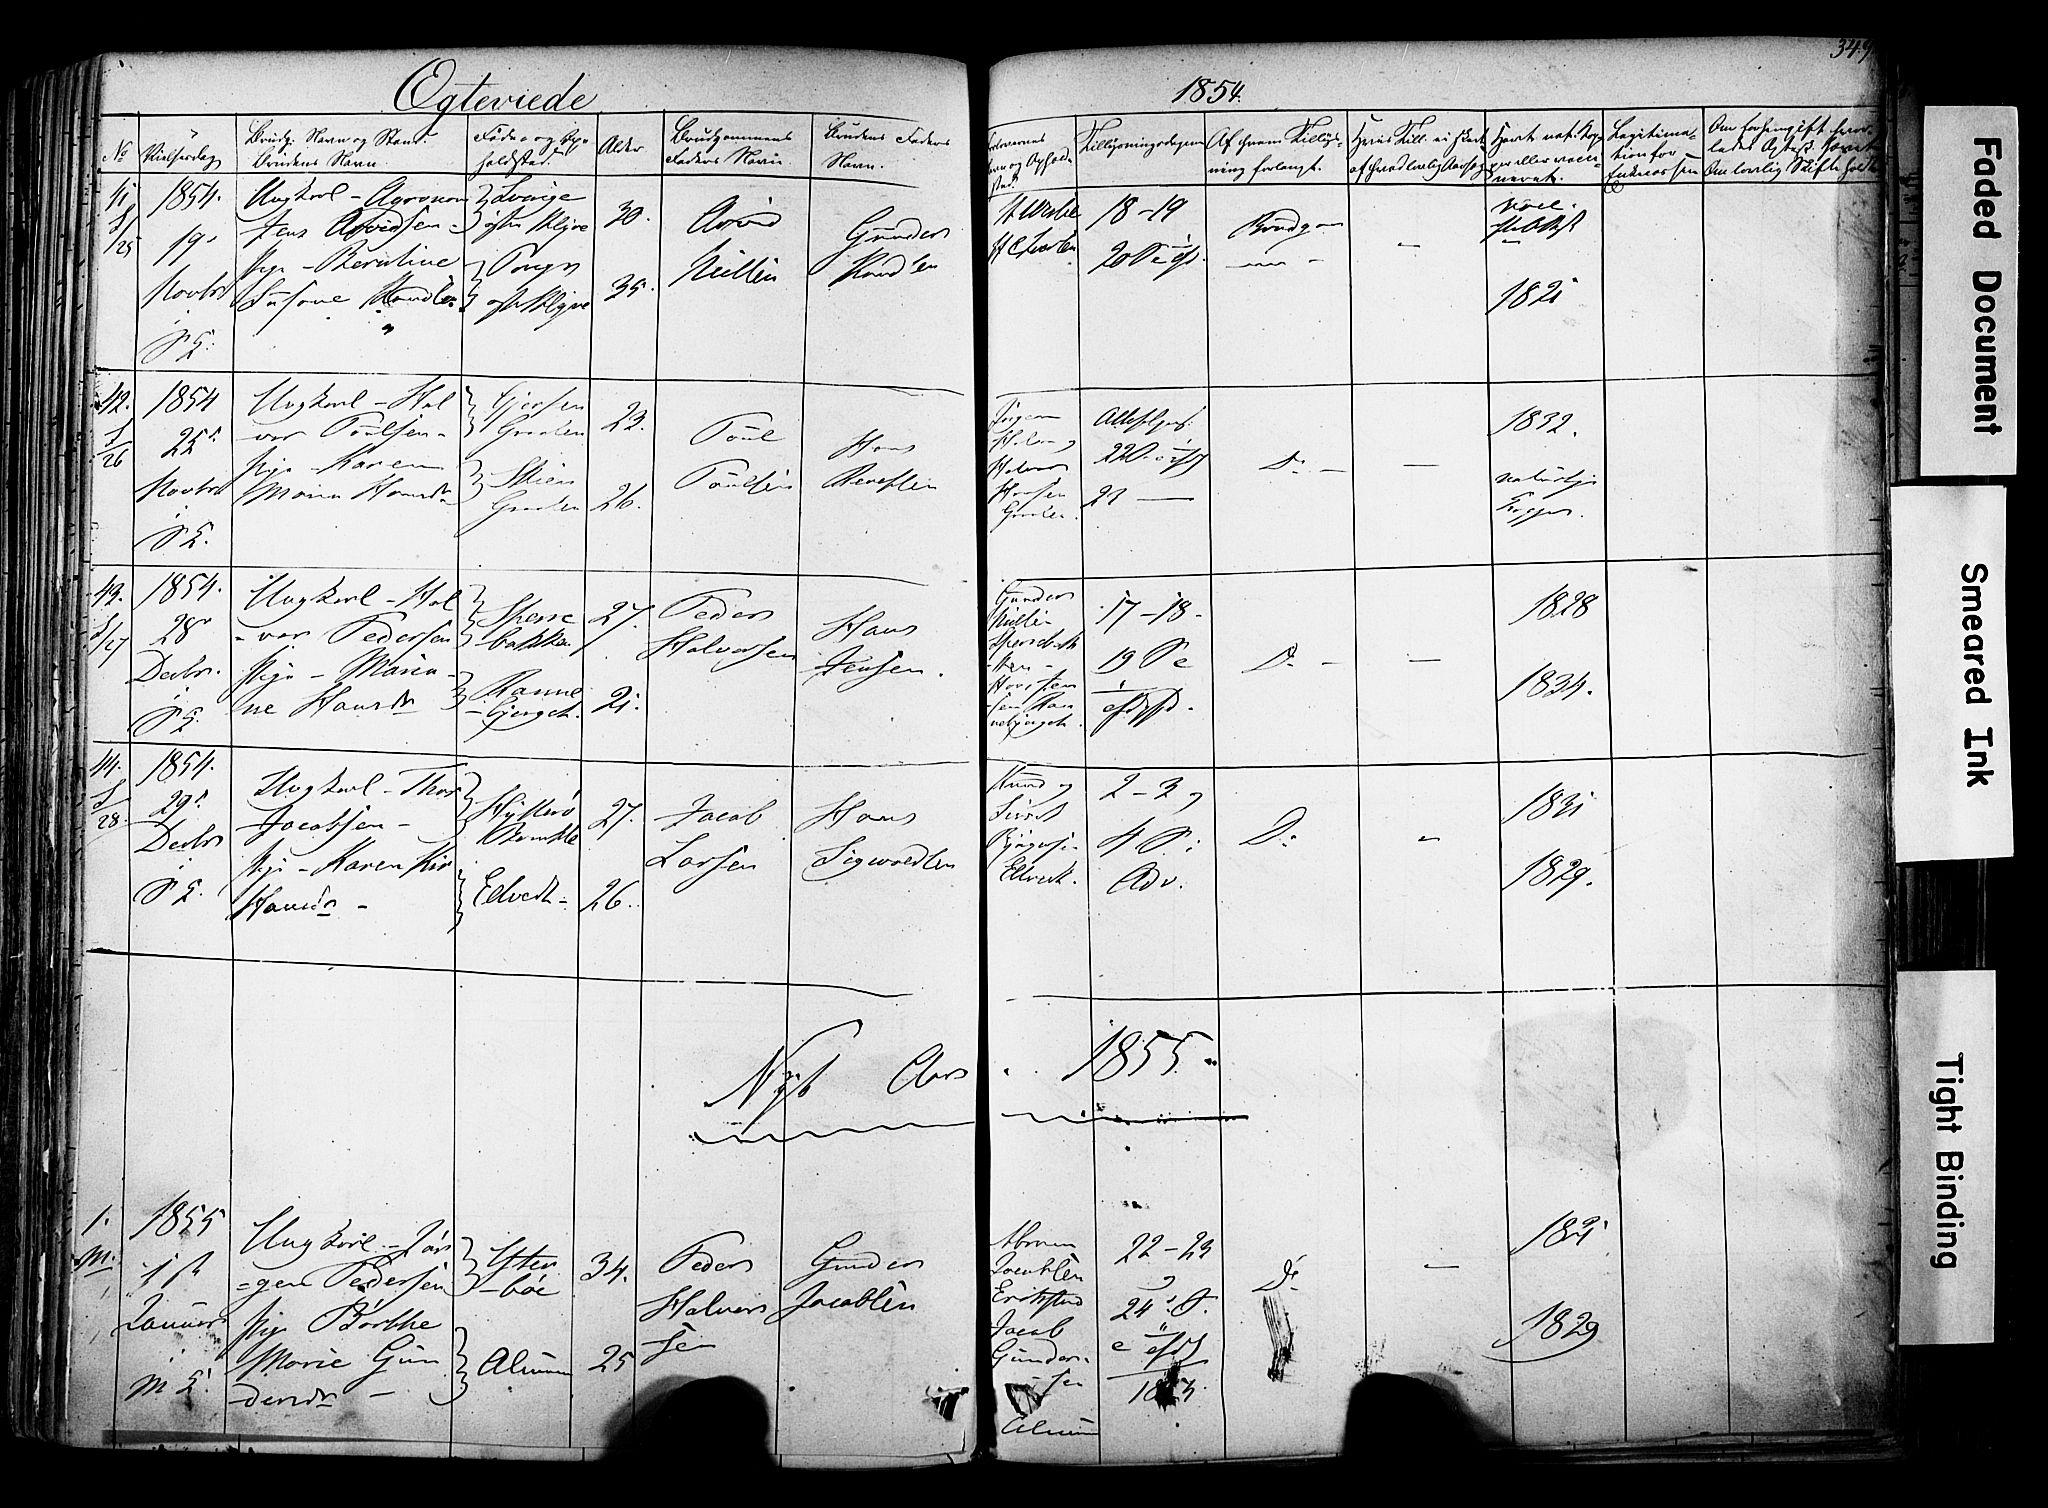 SAKO, Solum kirkebøker, F/Fa/L0006: Ministerialbok nr. I 6, 1844-1855, s. 349